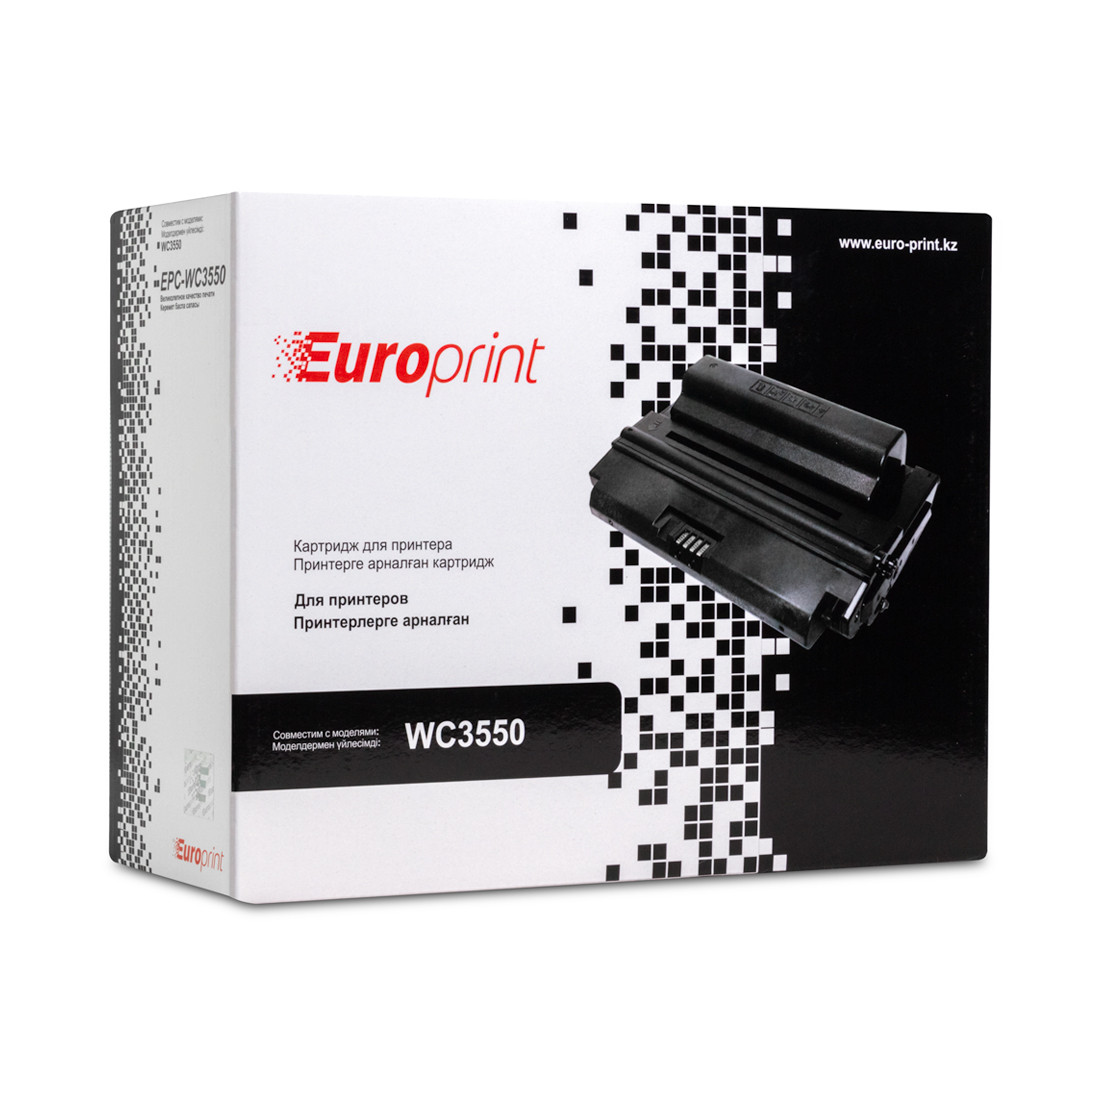 Картридж Europrint EPC-106R01529 Black (5000 страниц)